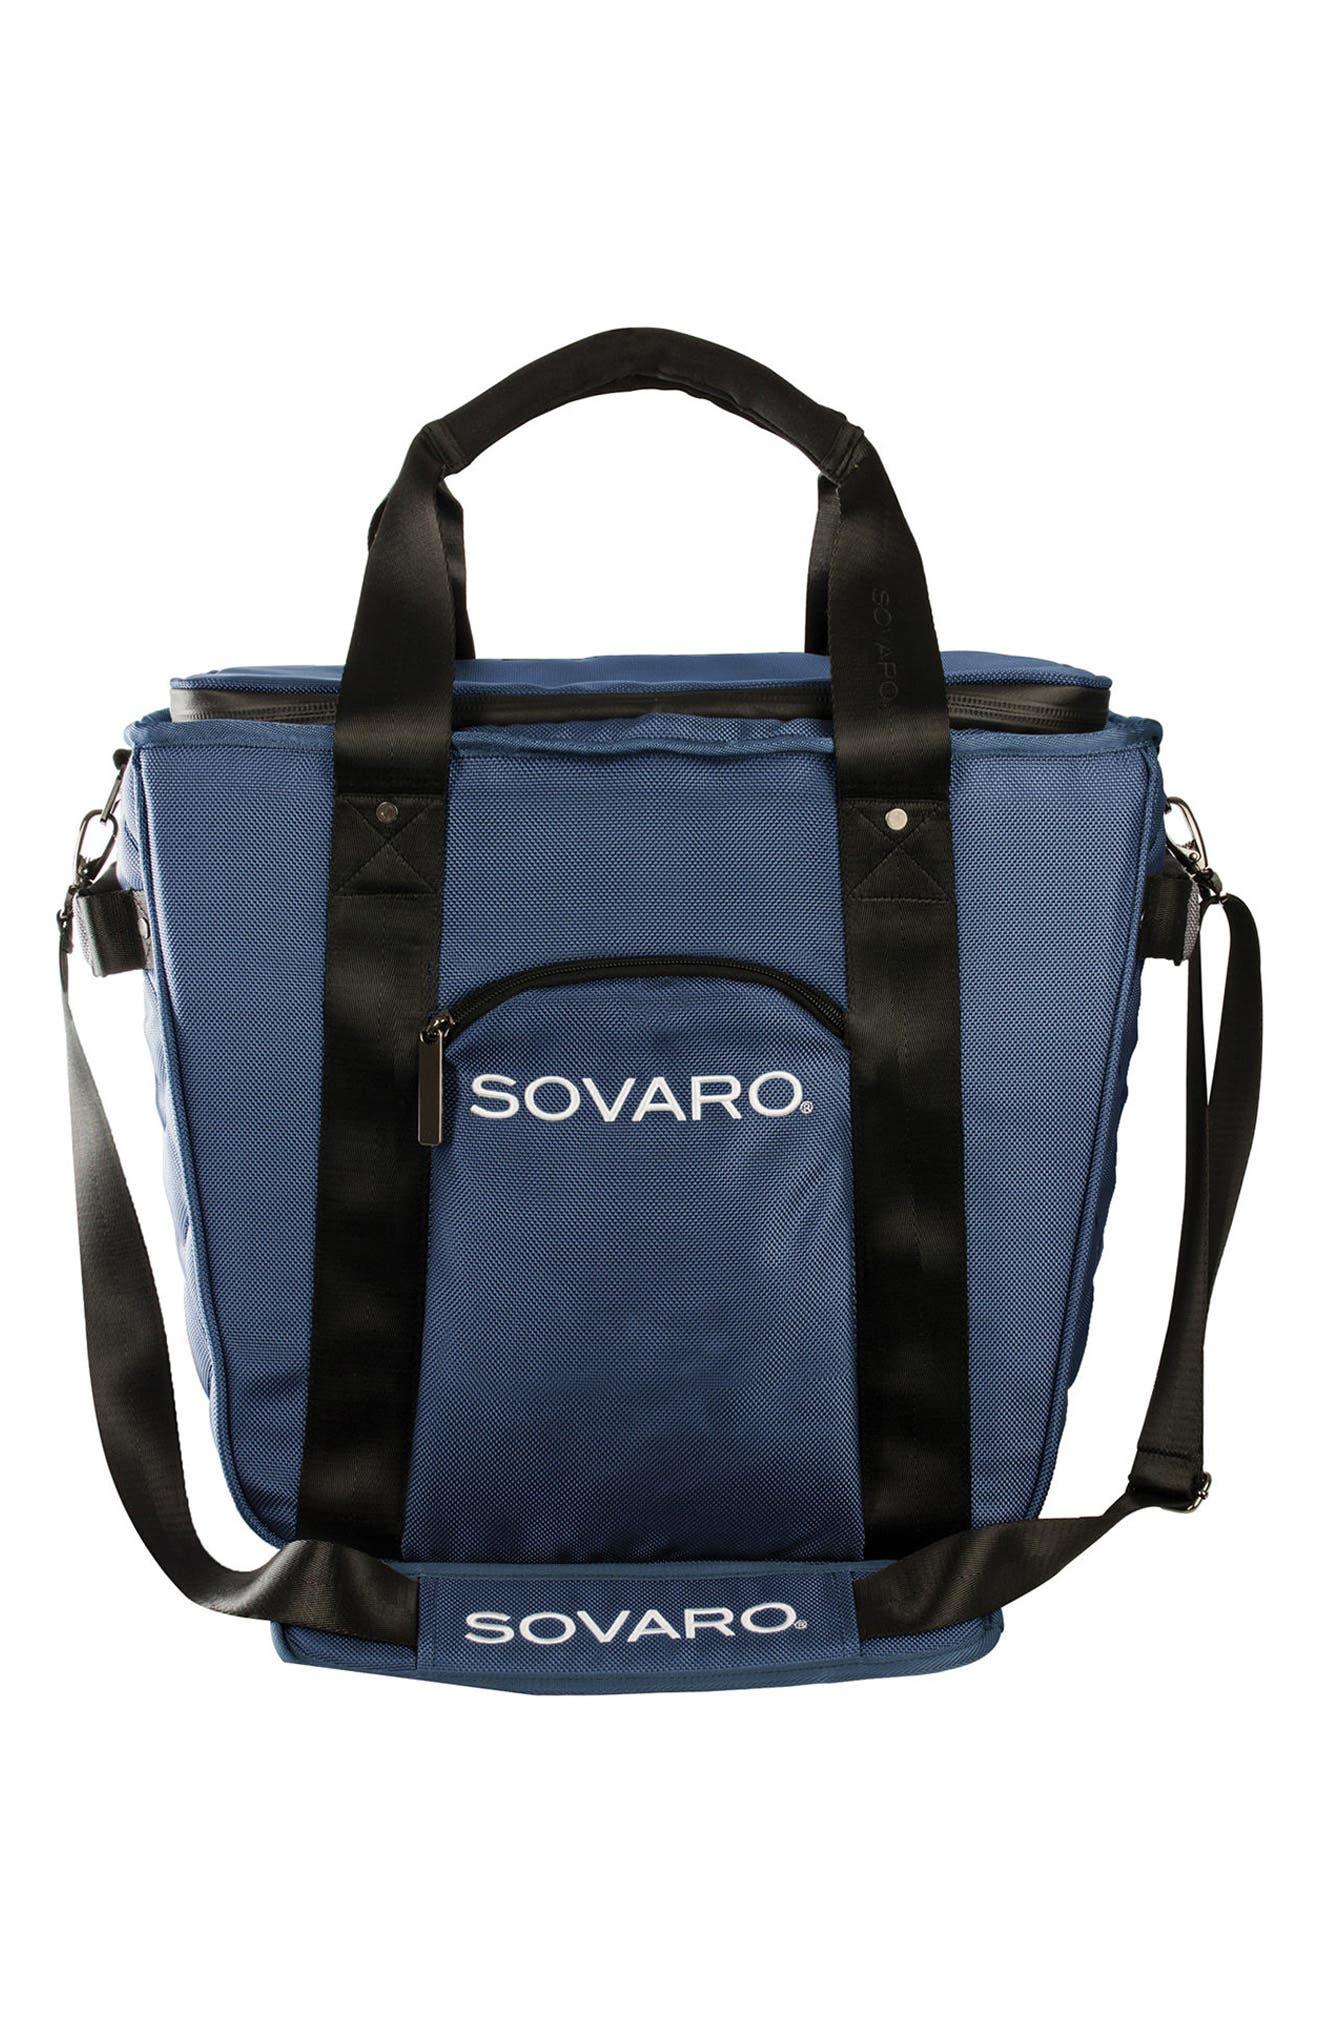 Sovaro 18-Inch Soft Sided Cooler